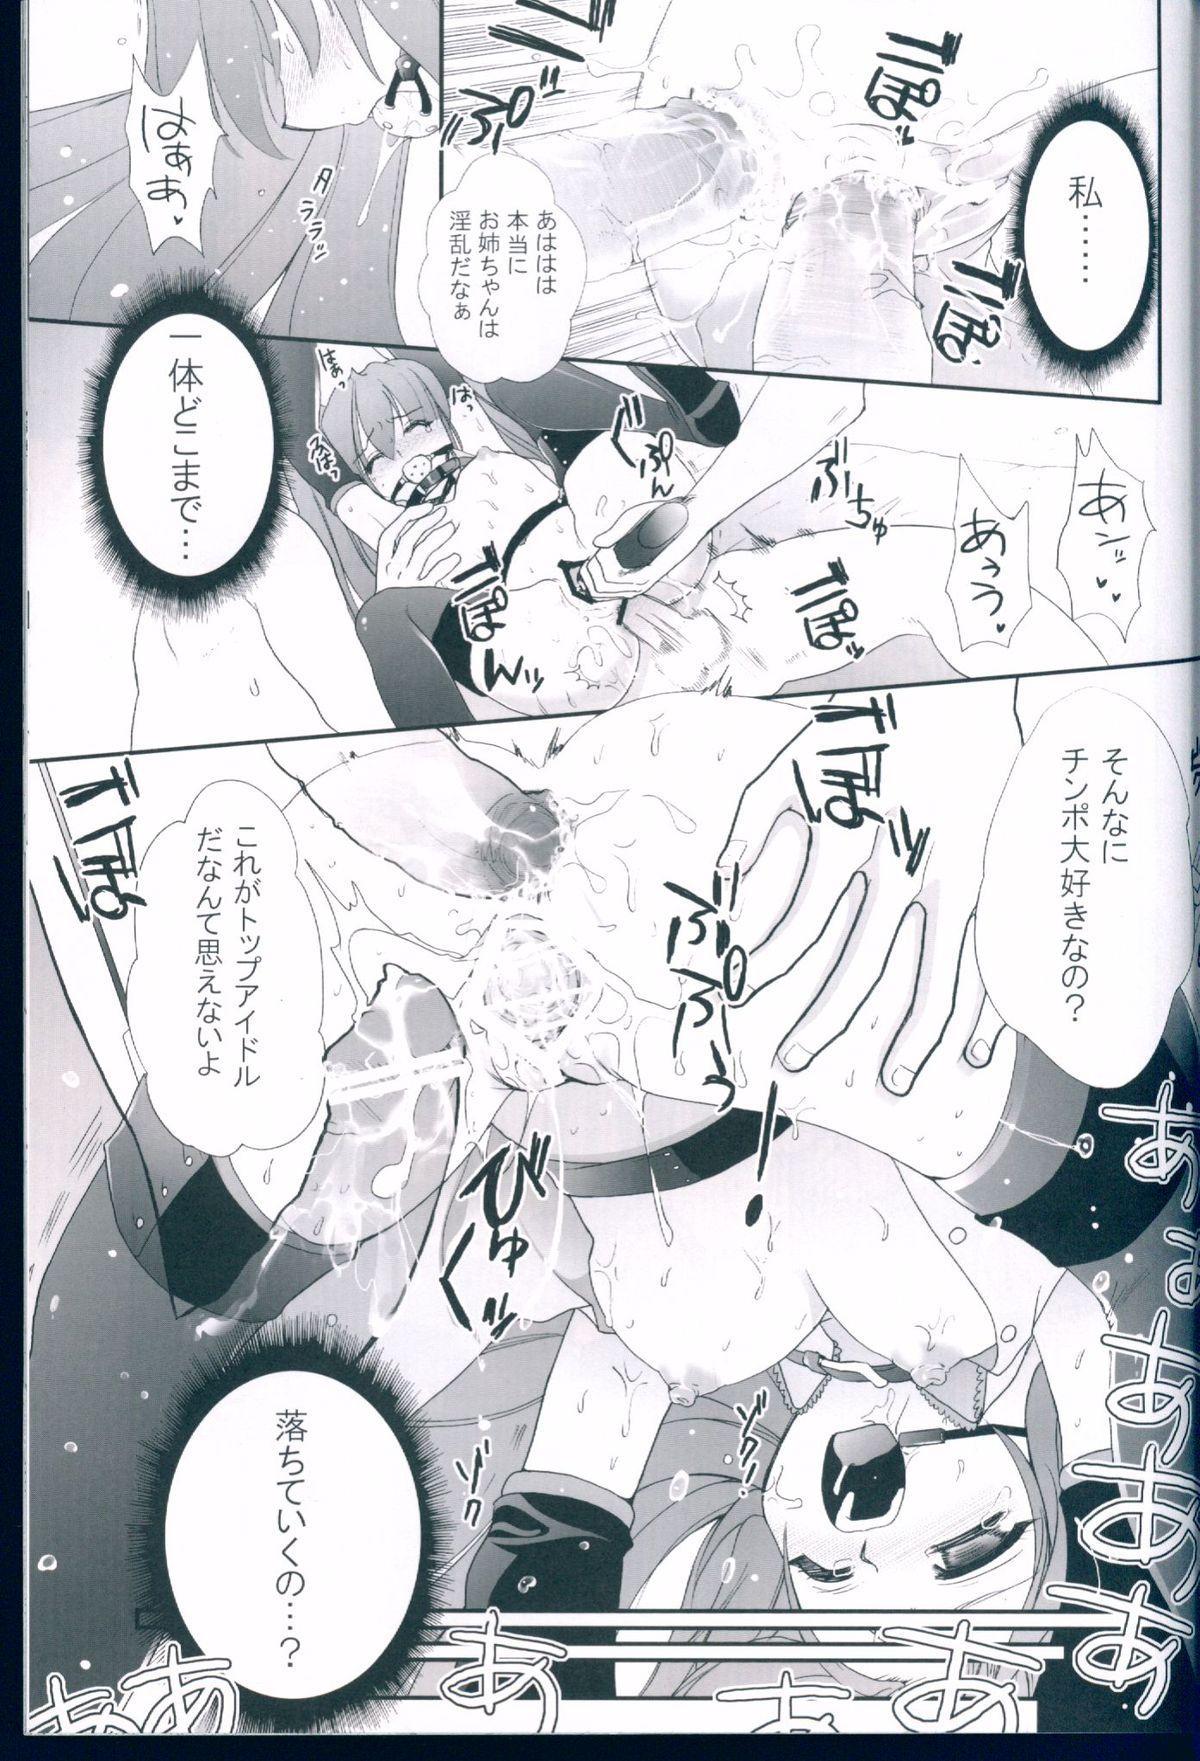 R Juu - Hatsune Miku Kenkan 20